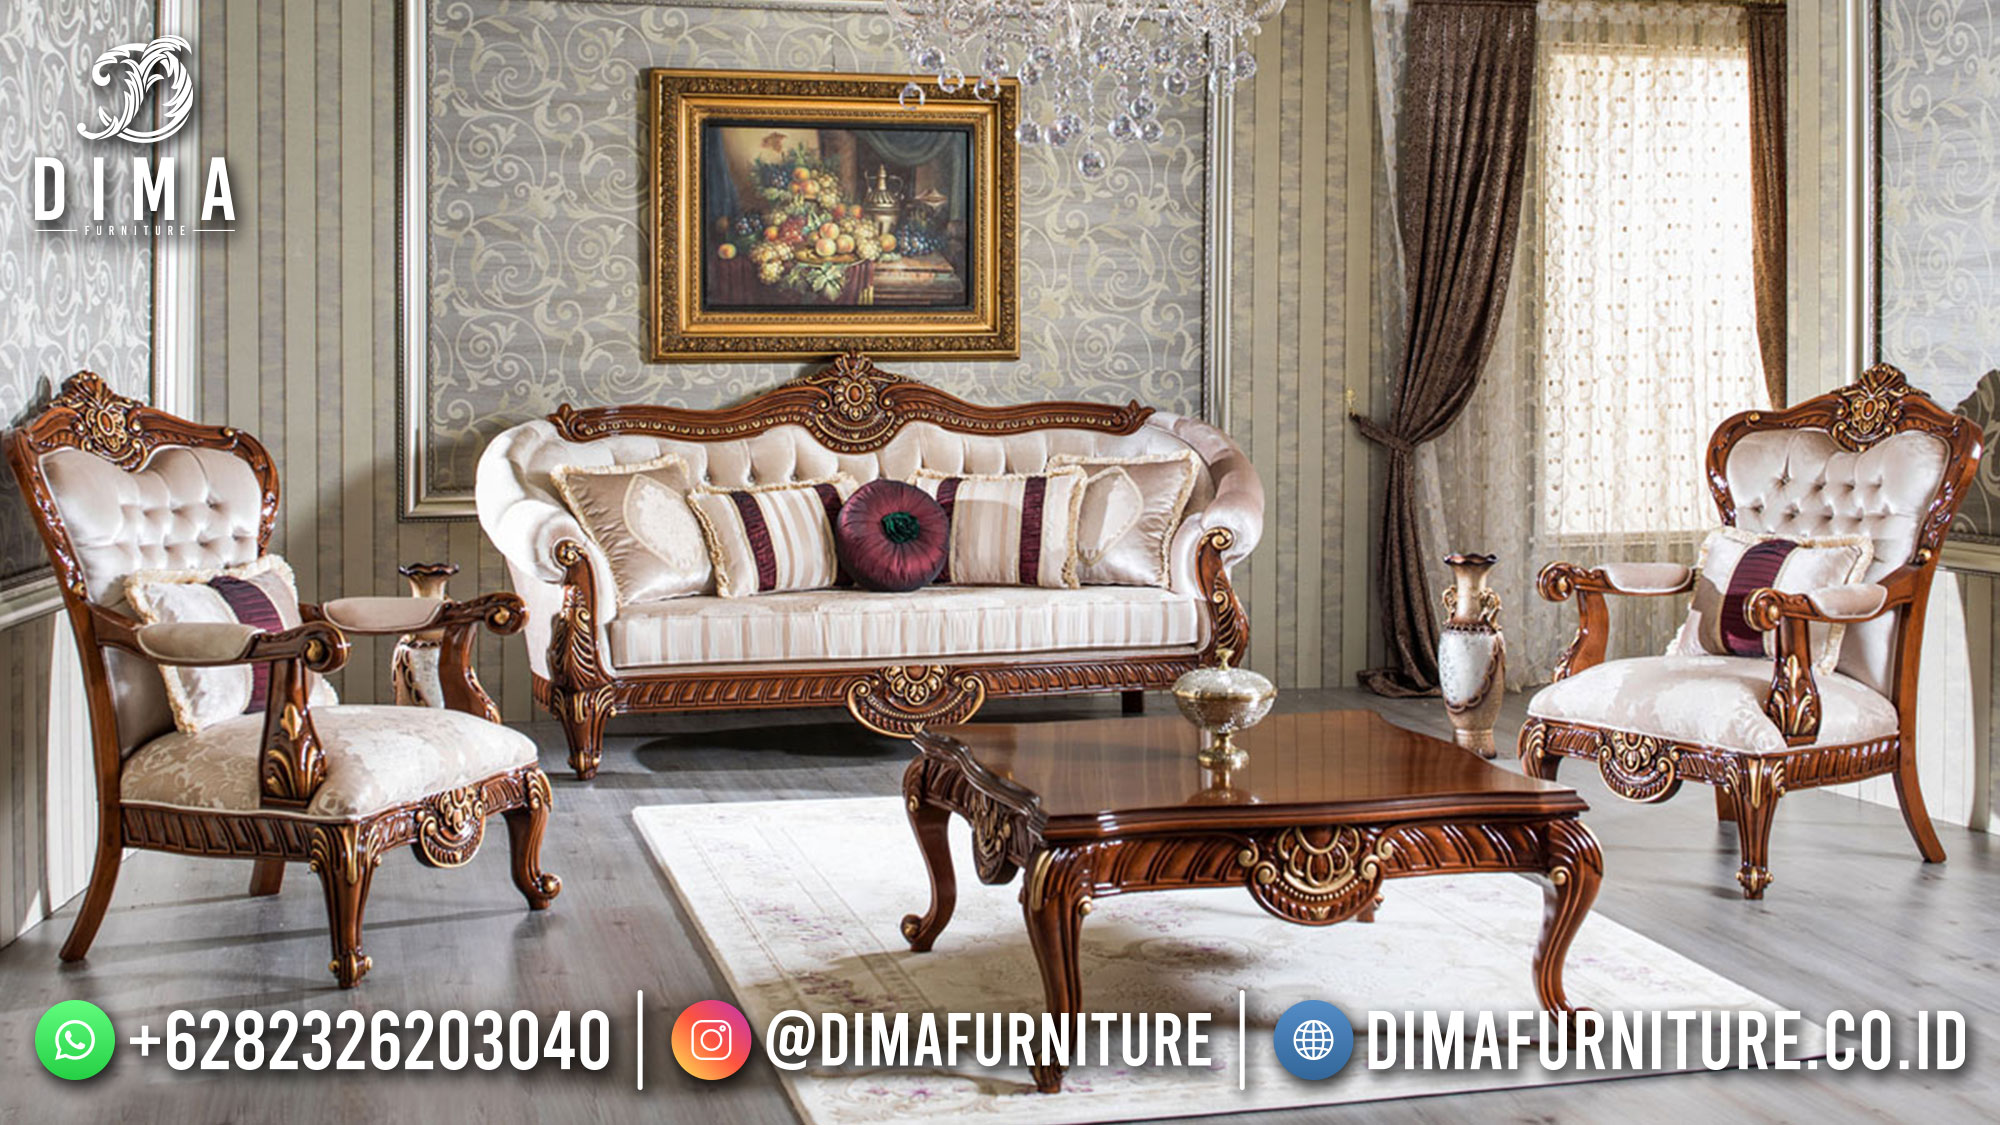 Sofa Tamu Mewah Jati Natural Classic Golden Luxury Combination ST-1451